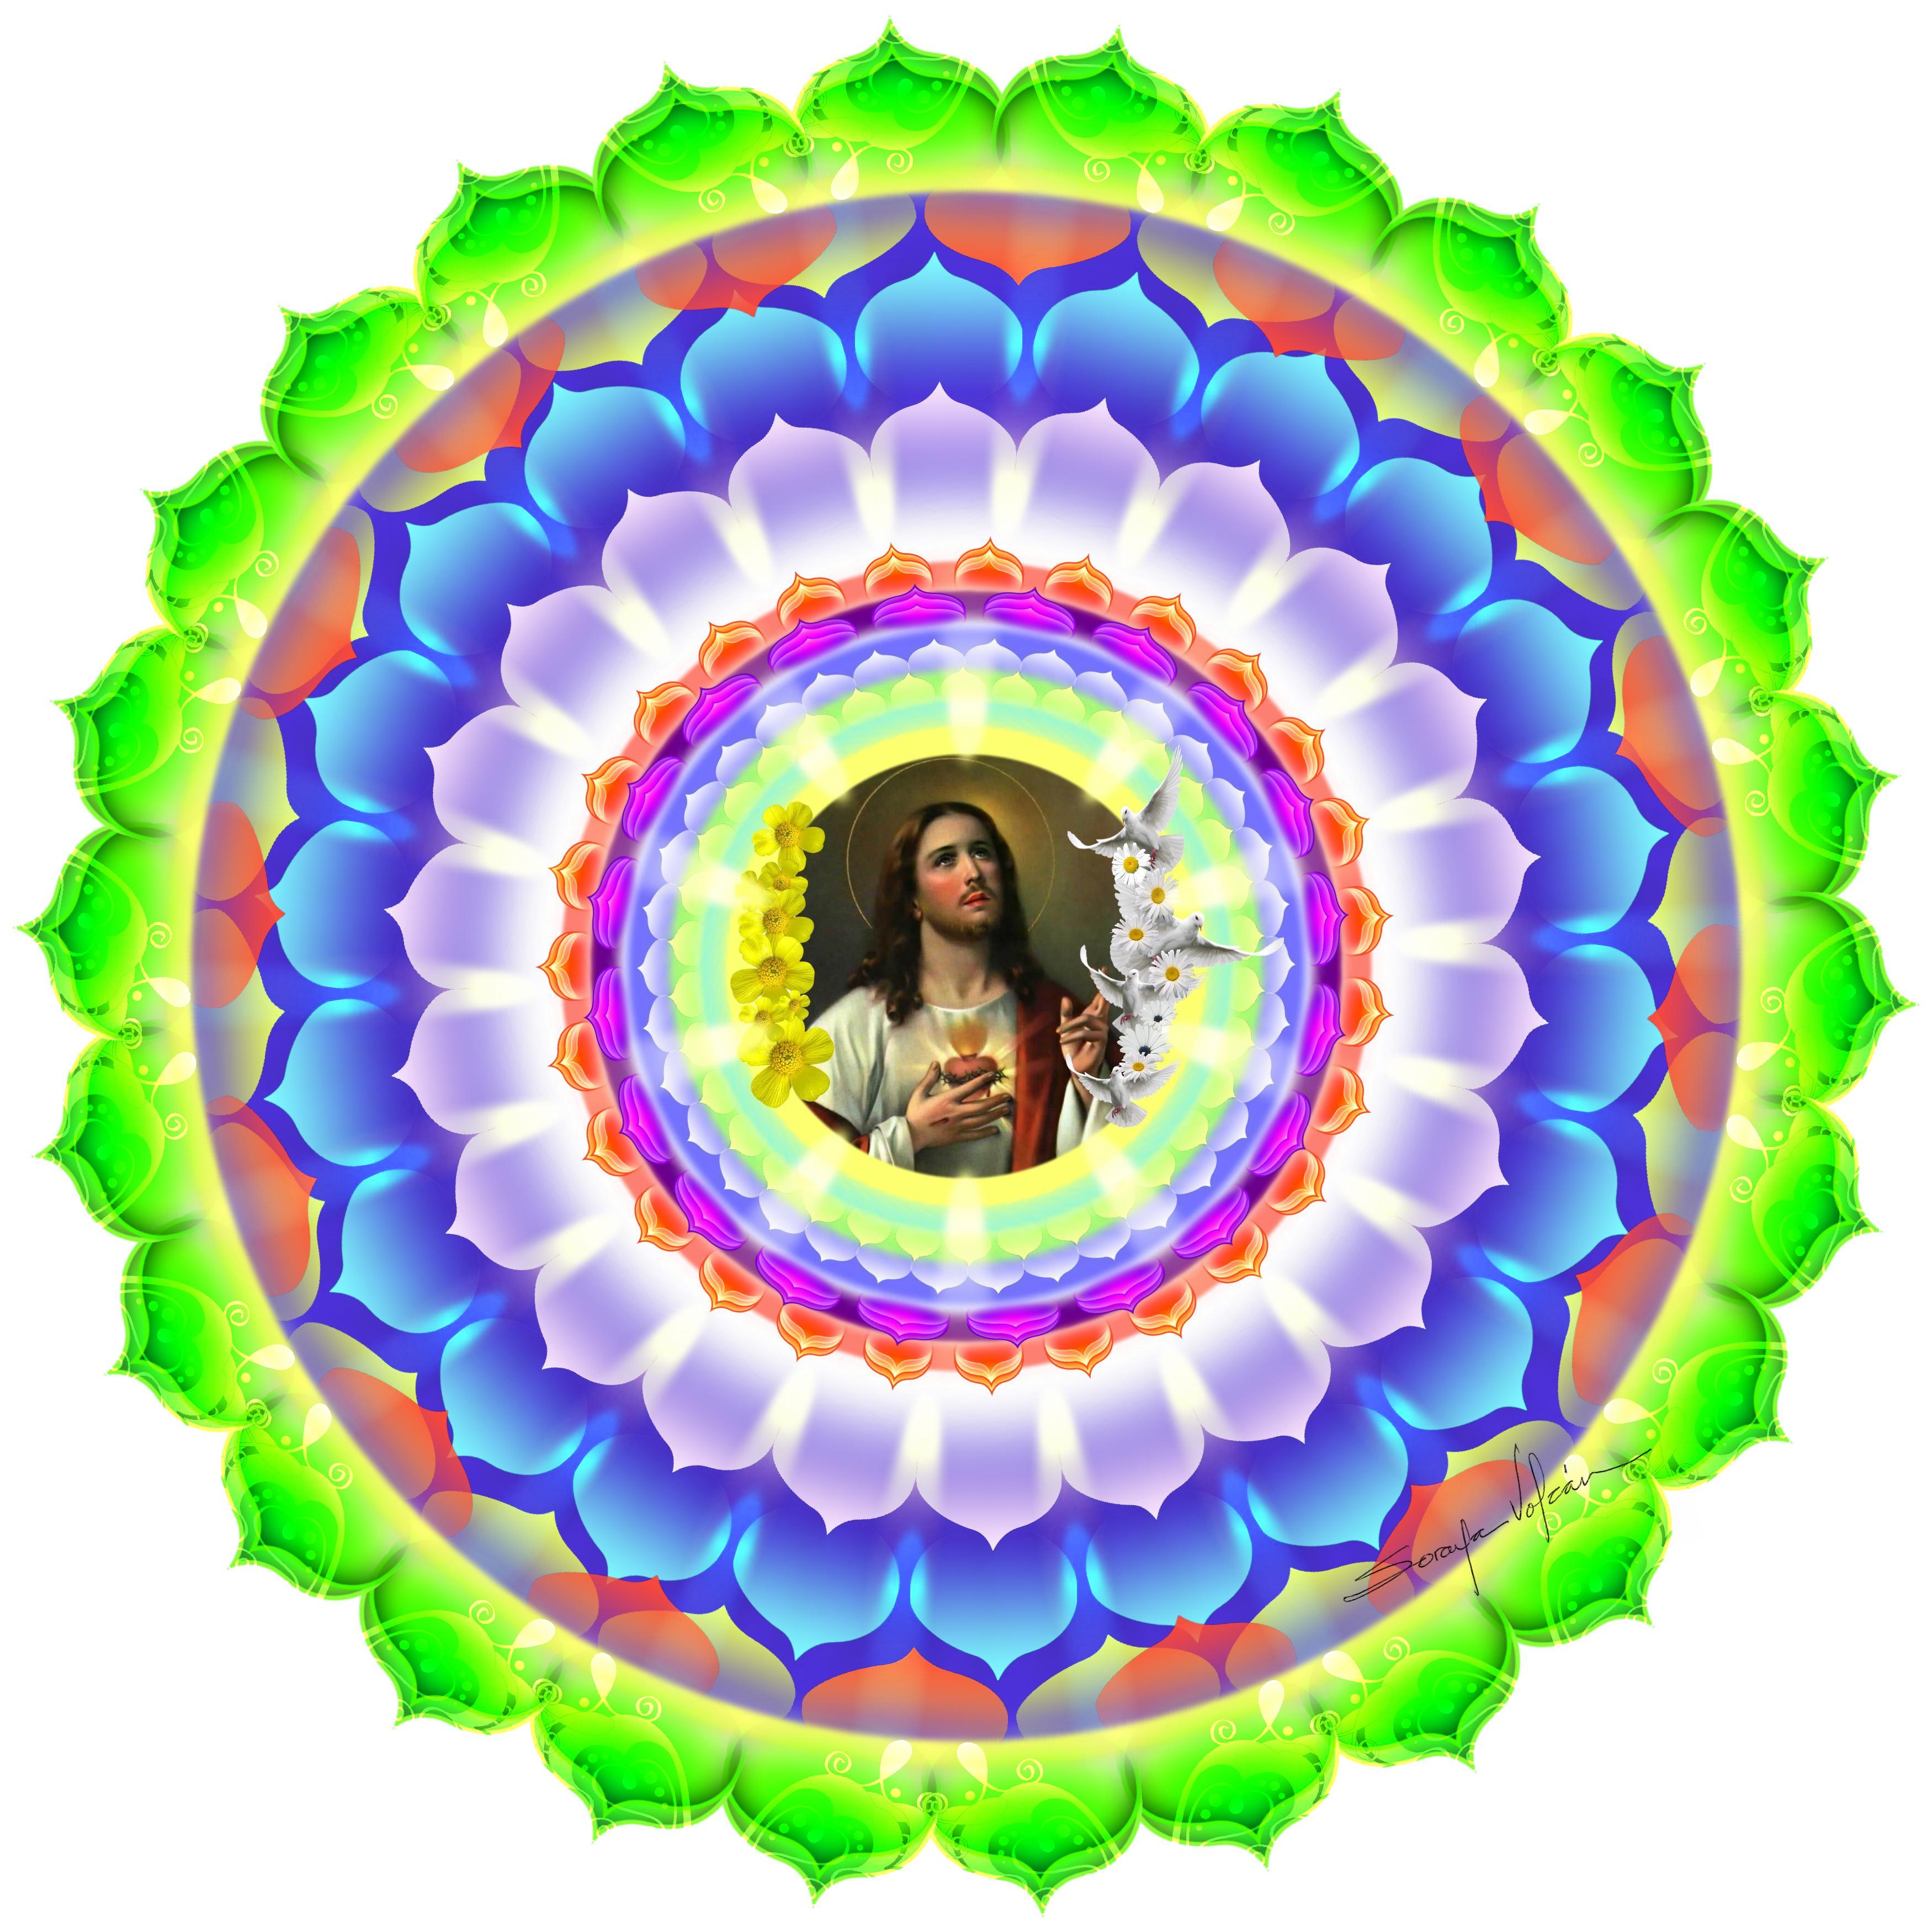 Mandala Corazón de Jesús